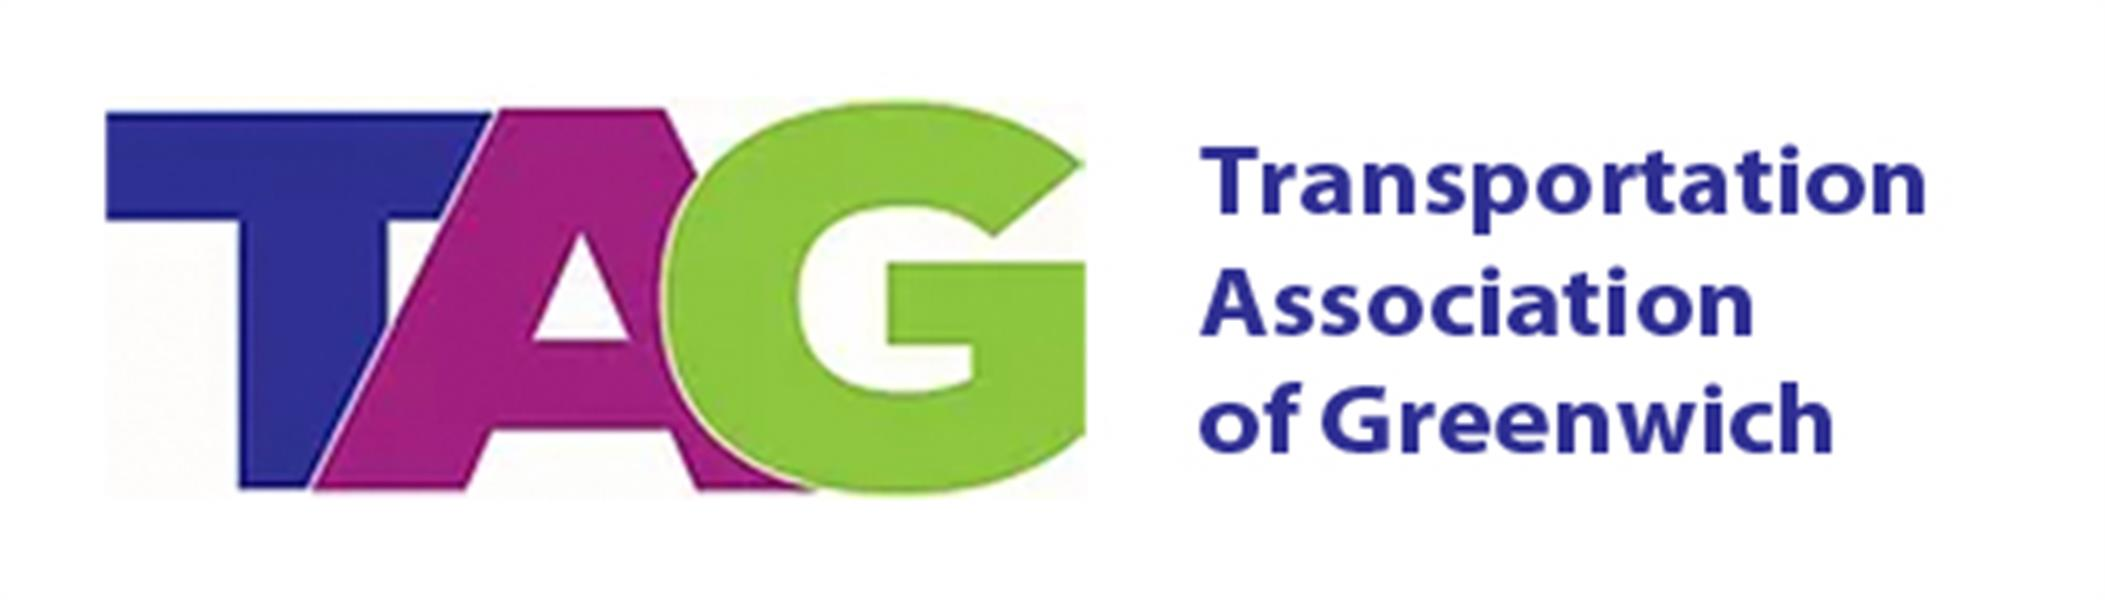 TAG_Logo_and_Name.jpg